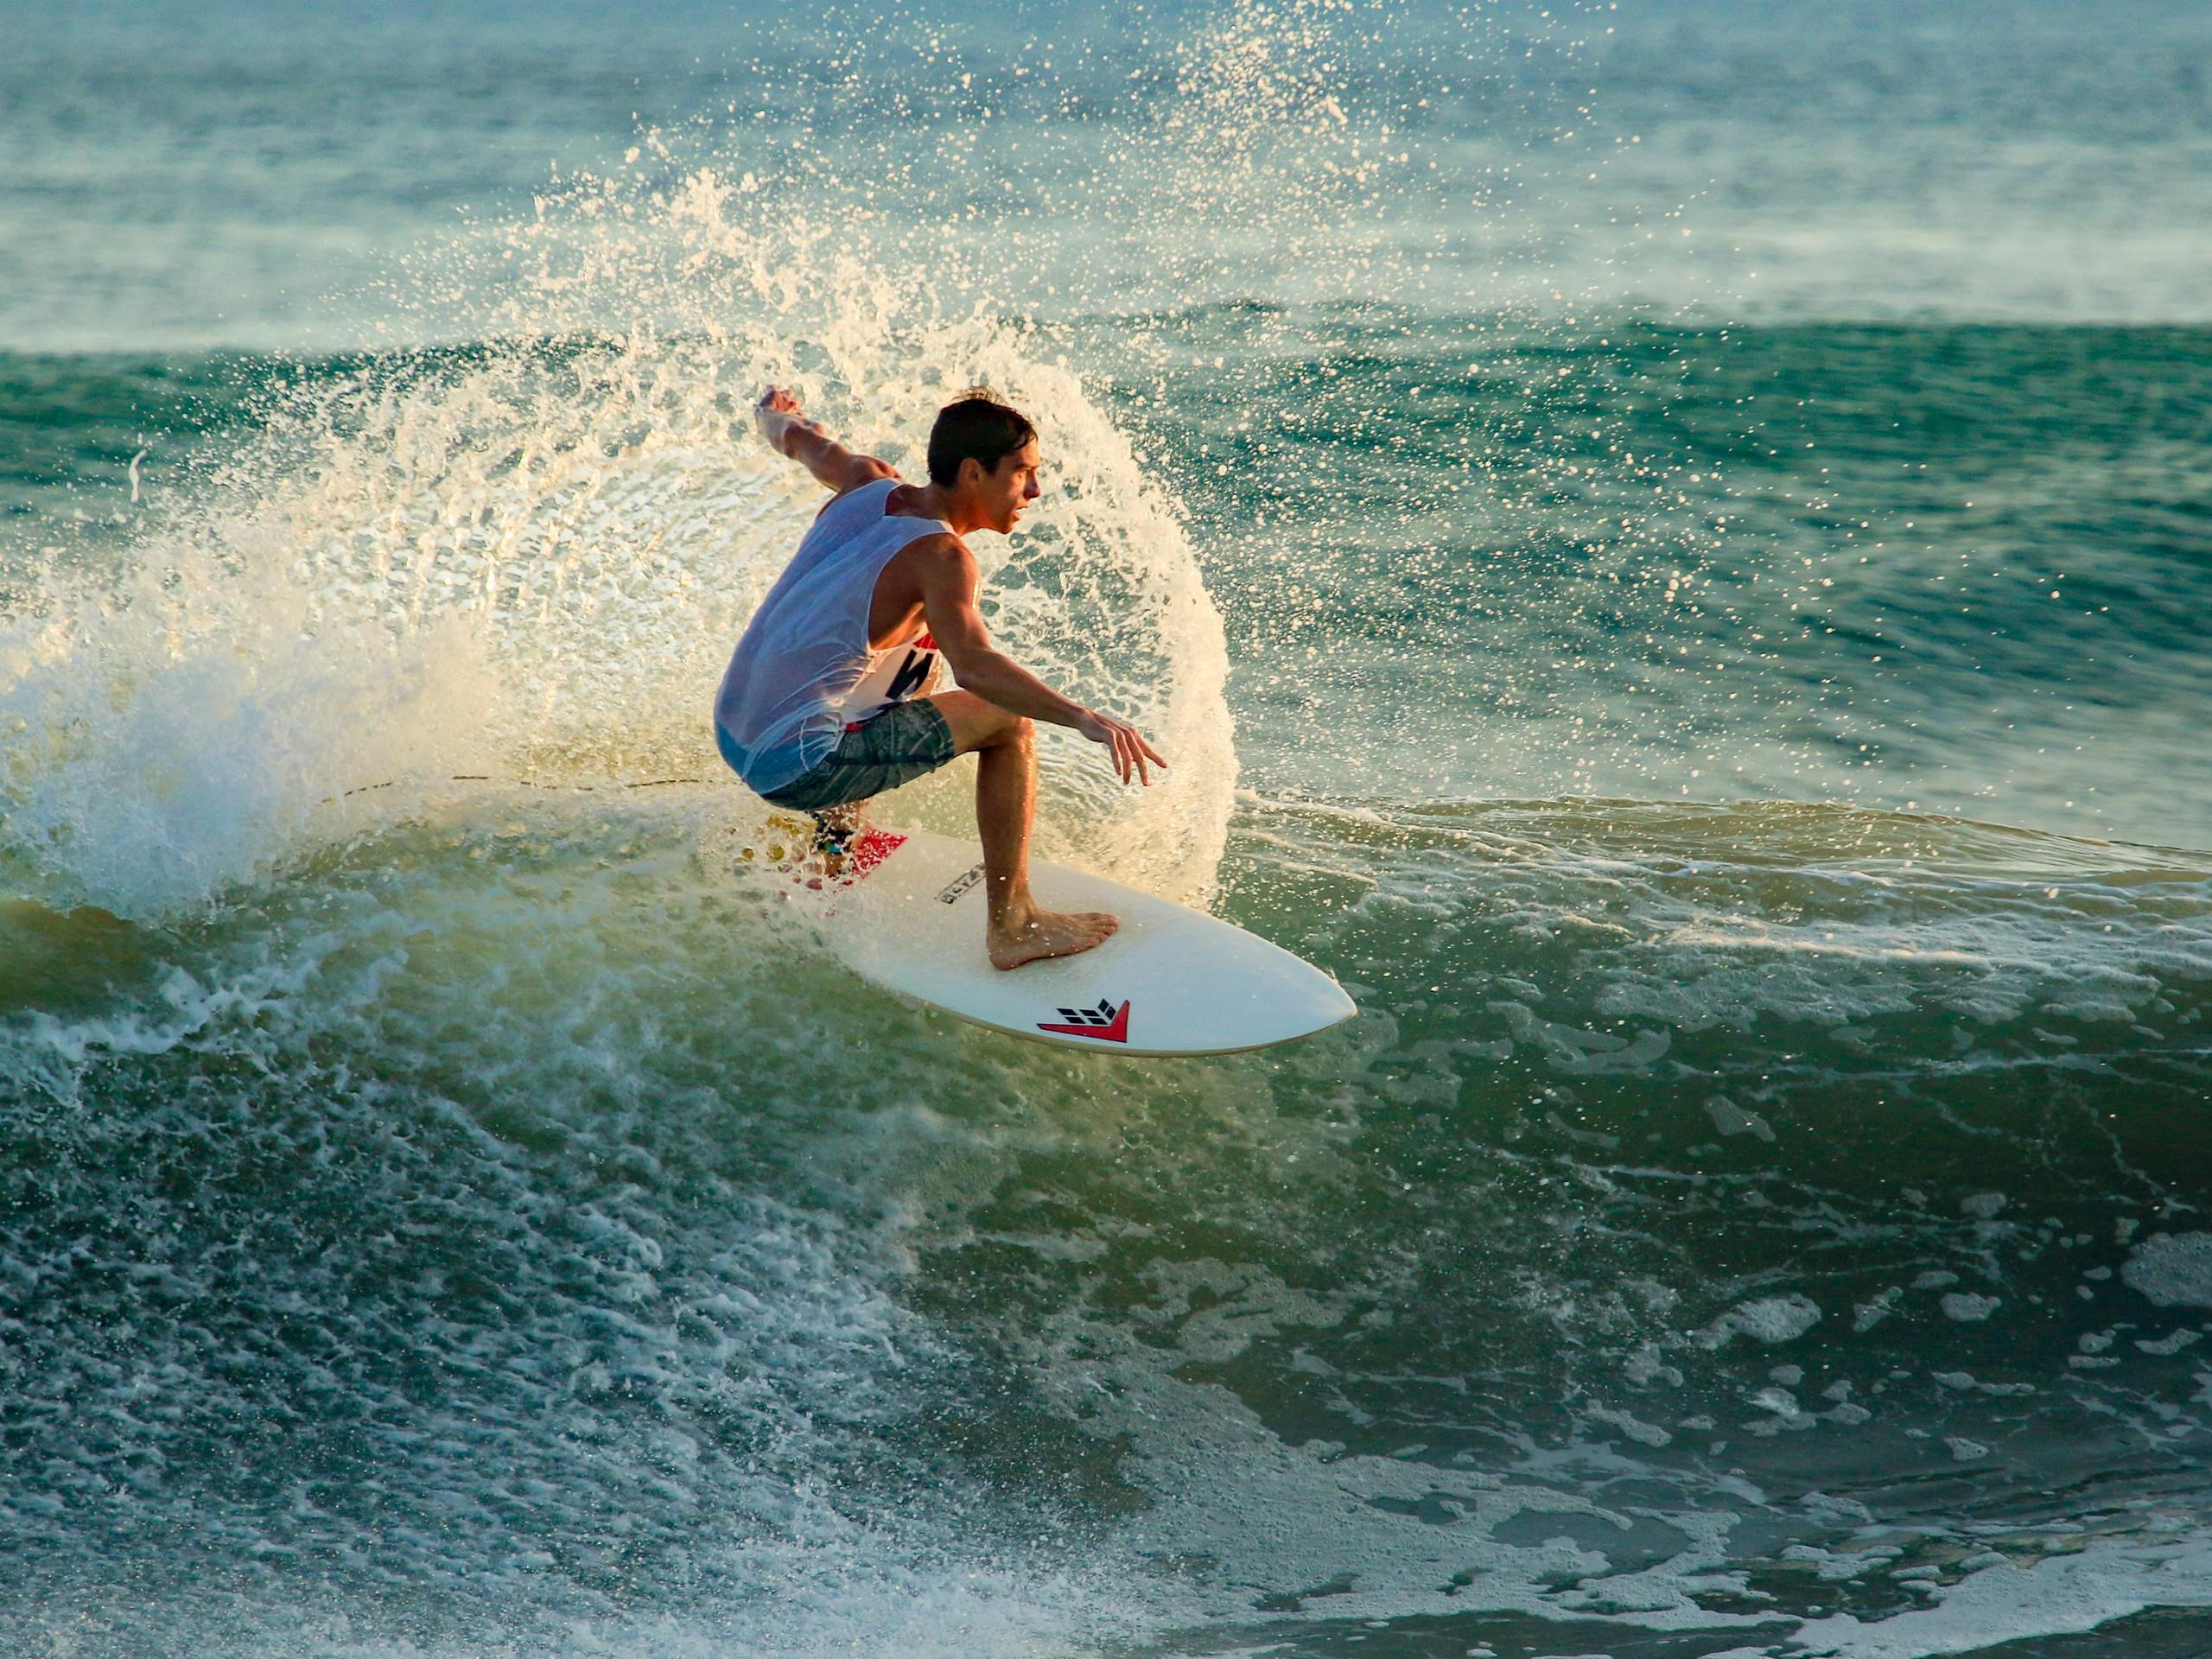 Surboarder in Nicaragua